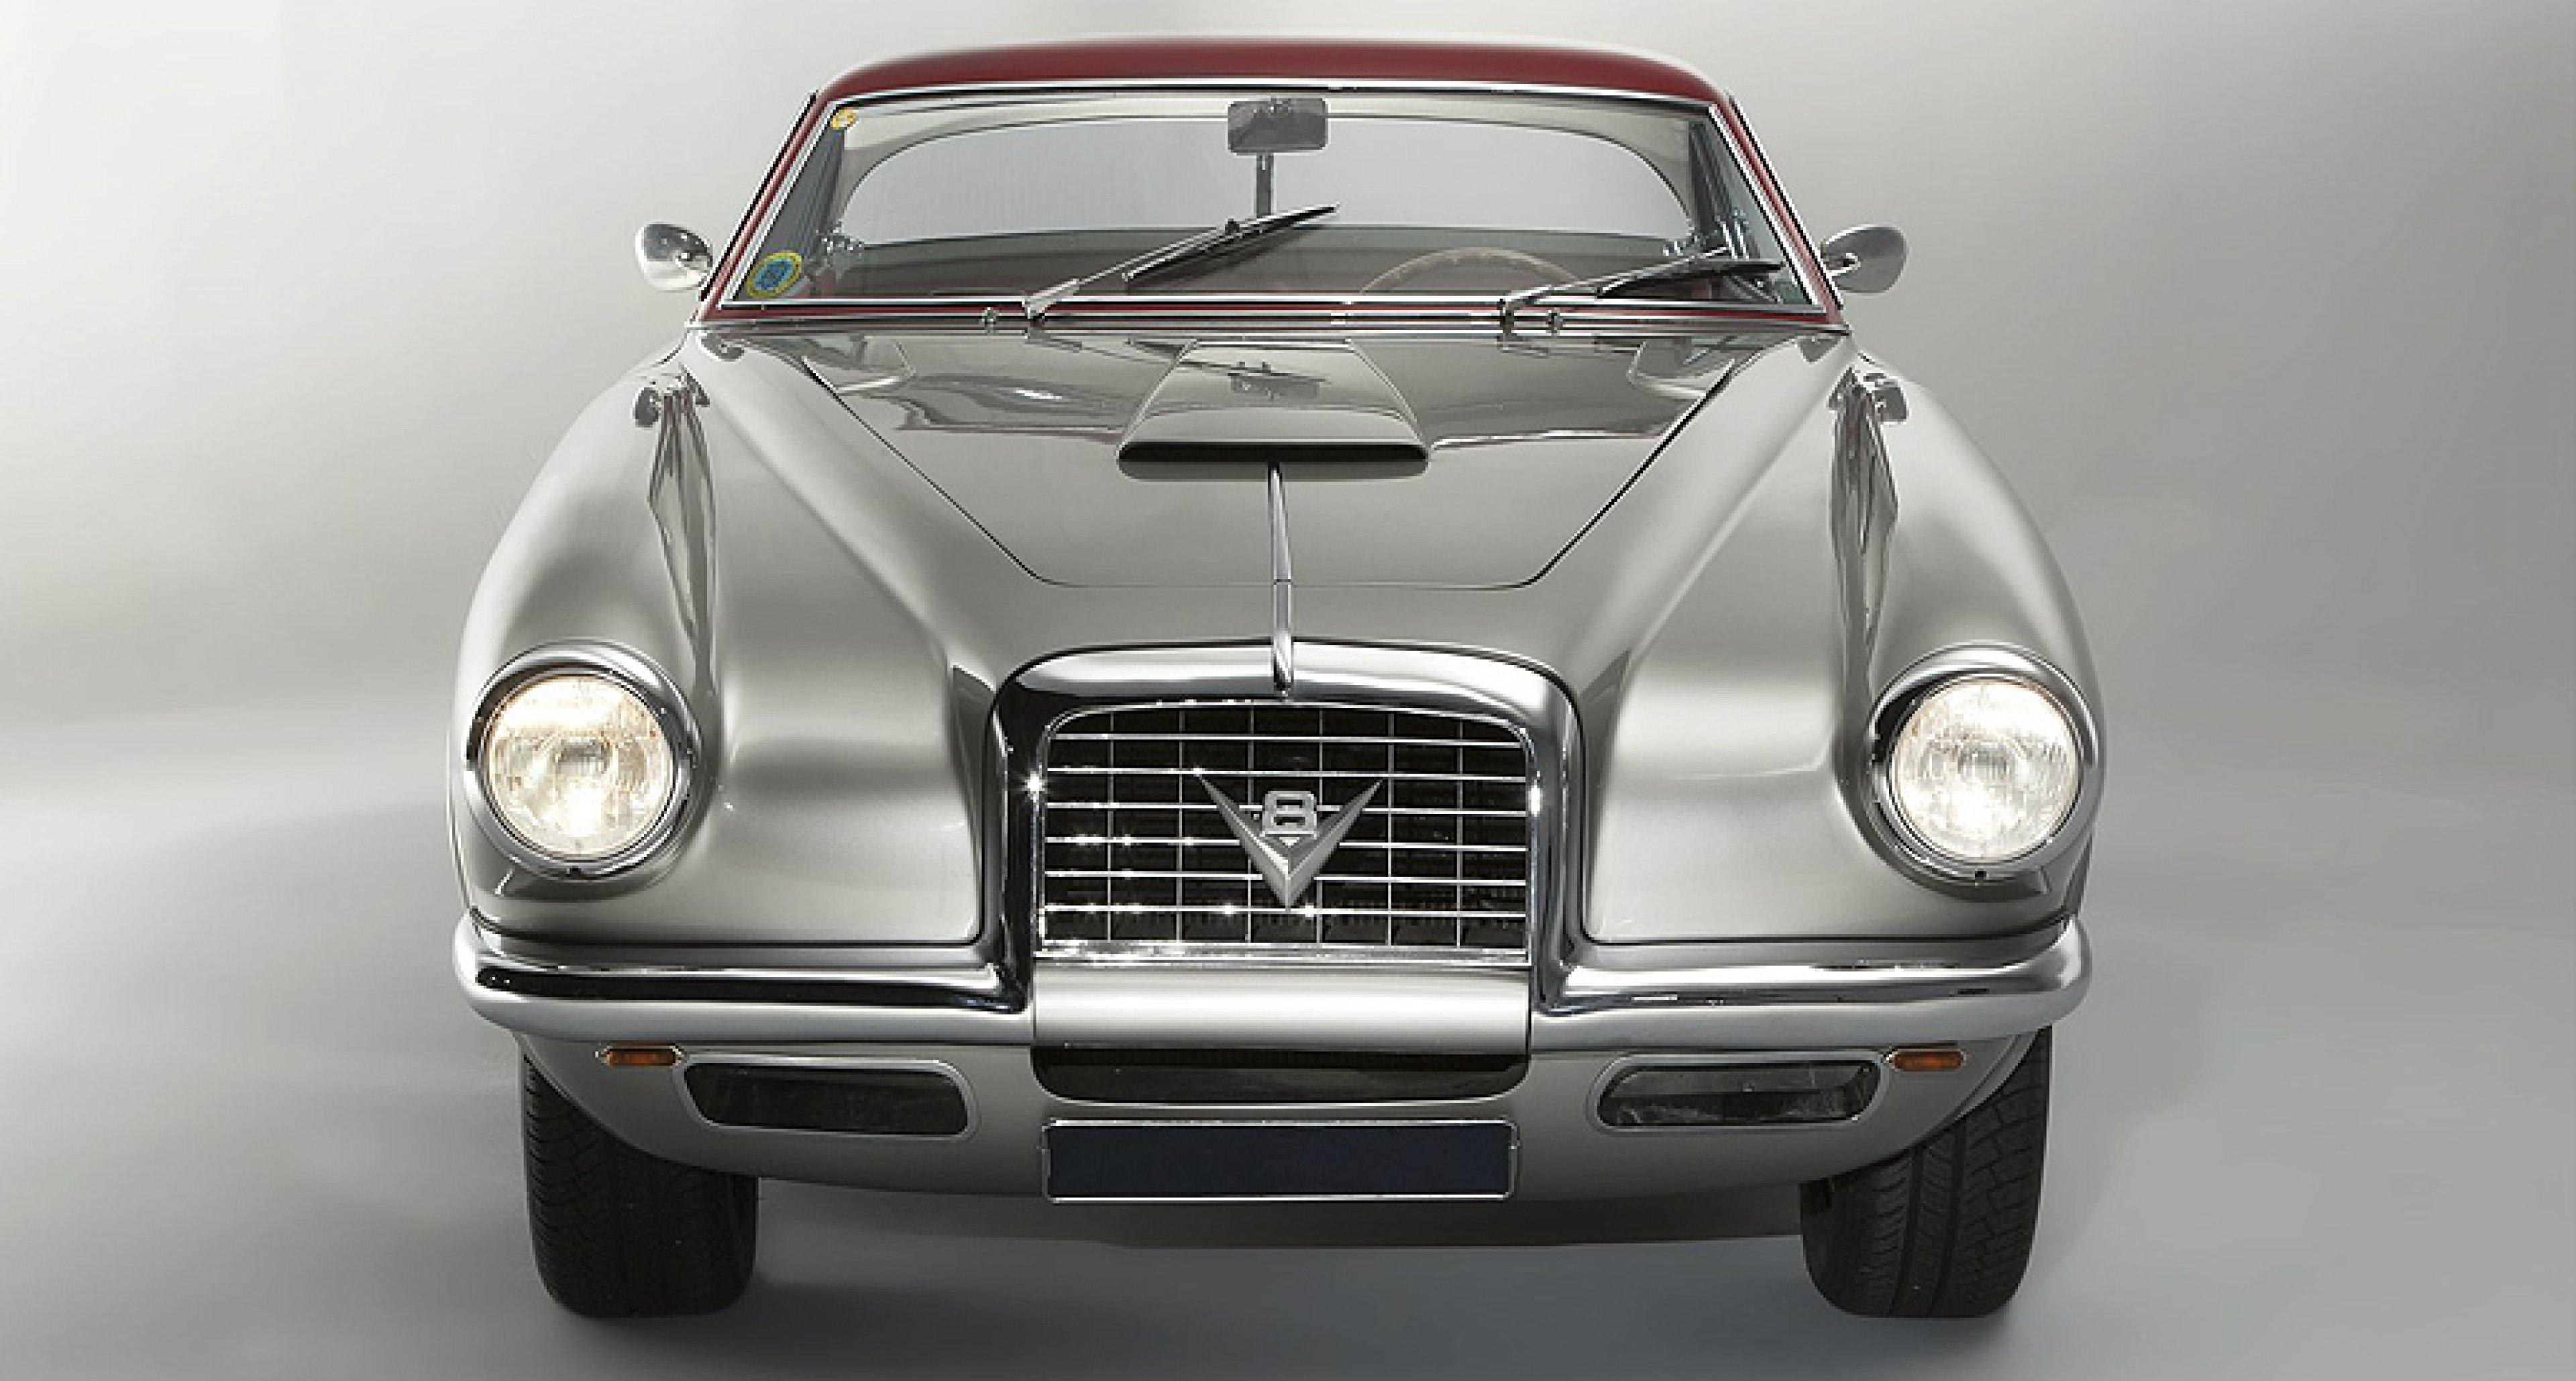 Fiat 'Otto Vu' Coupé by Vignale: One of thirteen